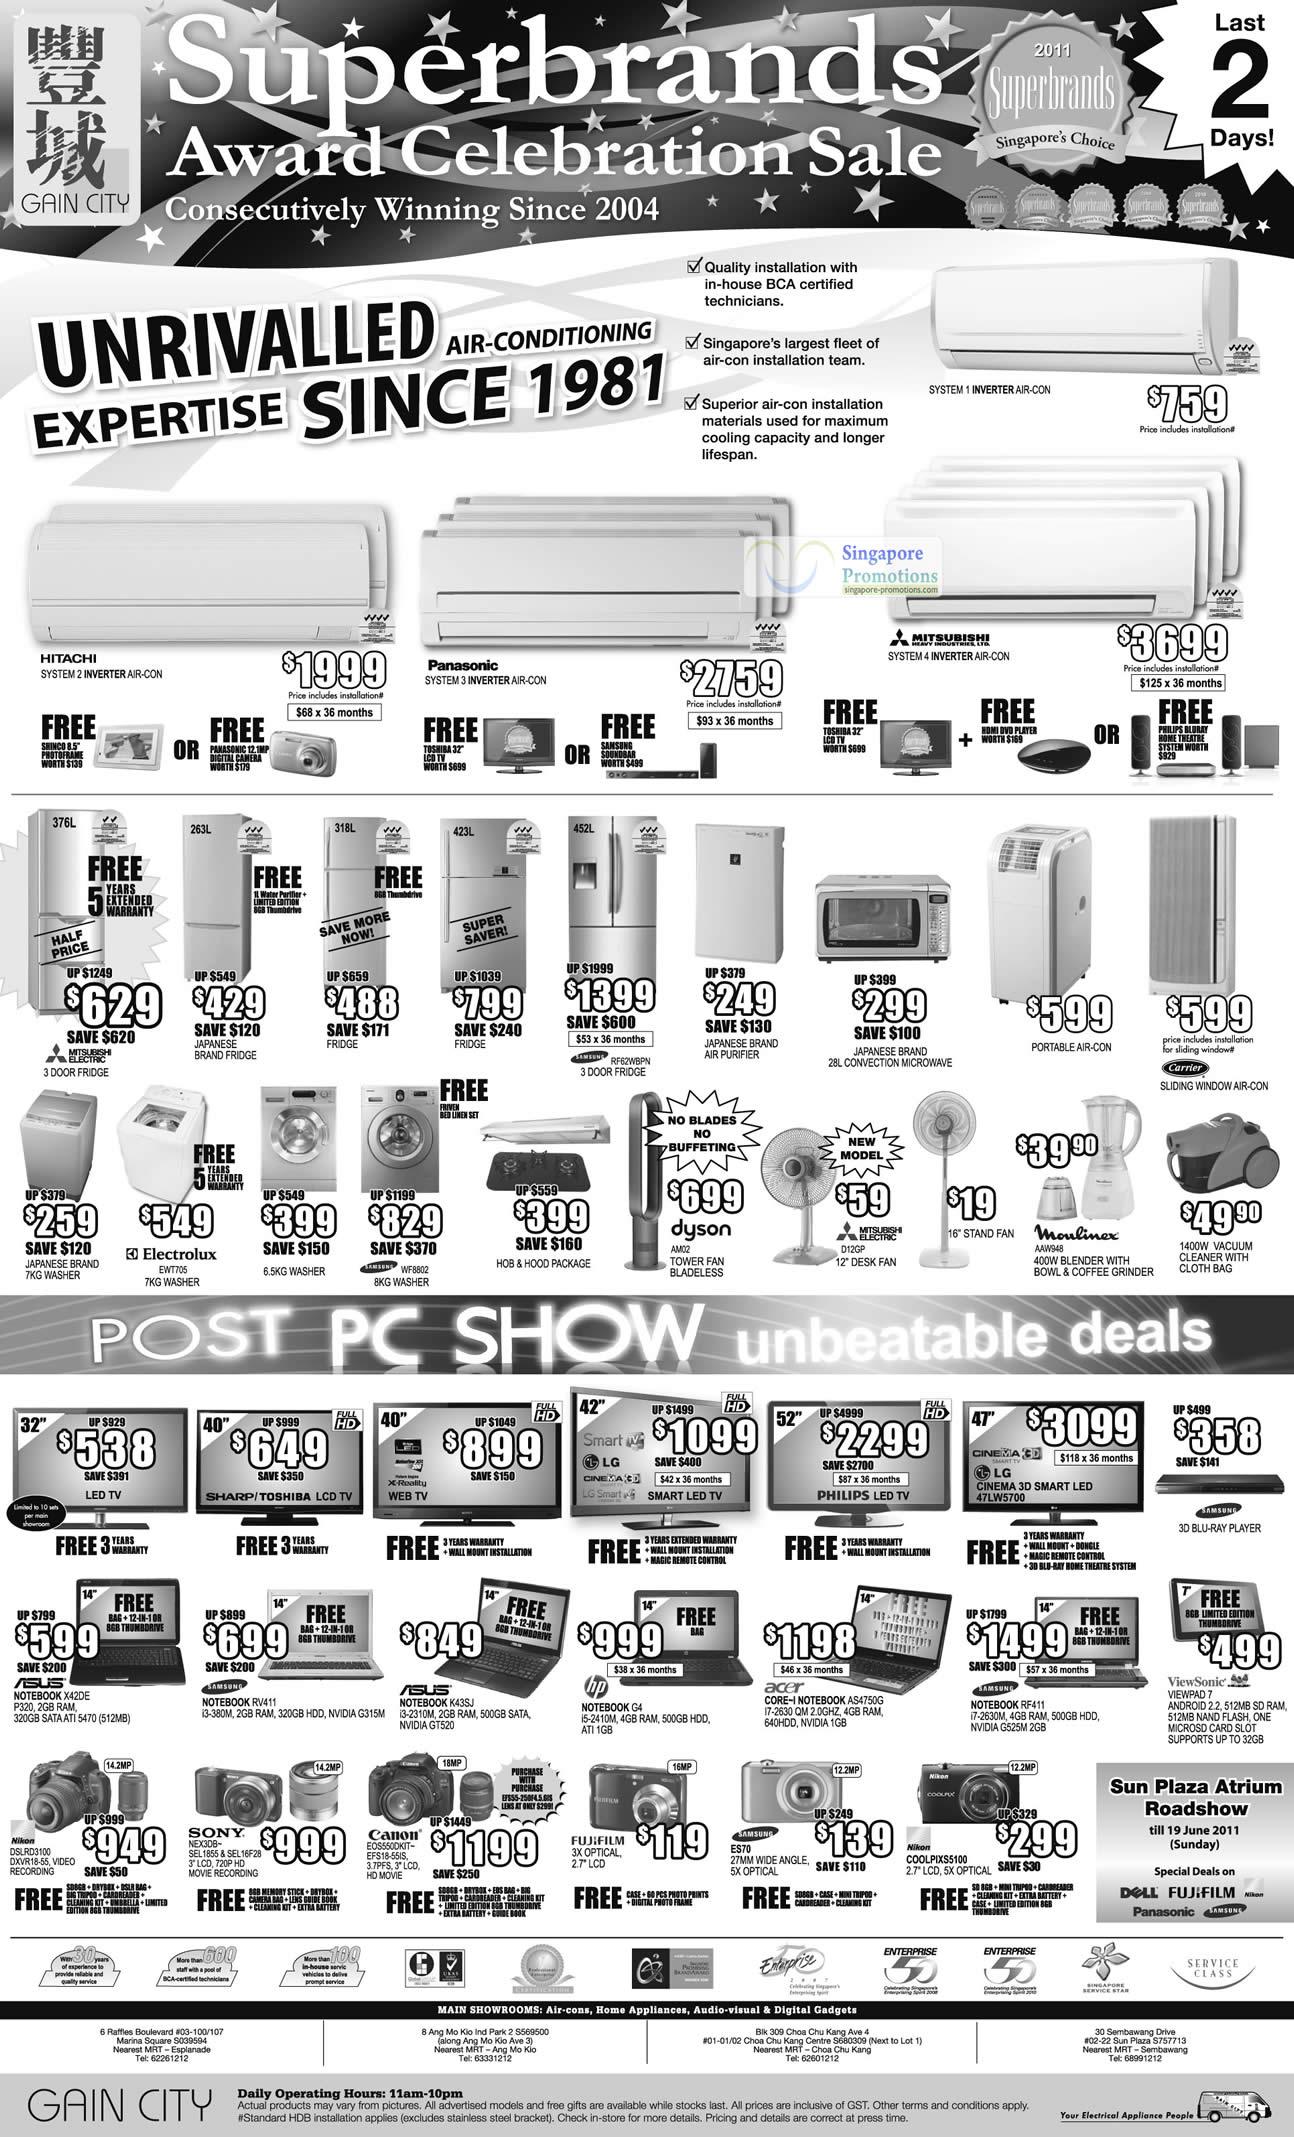 Air Conditioner, Fridge, Electrolux, Carrier Sliding Window Aircon, Oven, Notebooks ASUS X42DE, Samsung RV411, K43SJ, HP G4, Acer AS4750G, RF411, Viewsonic VIewpad 7, Nikon D3100, Canon EOS550D